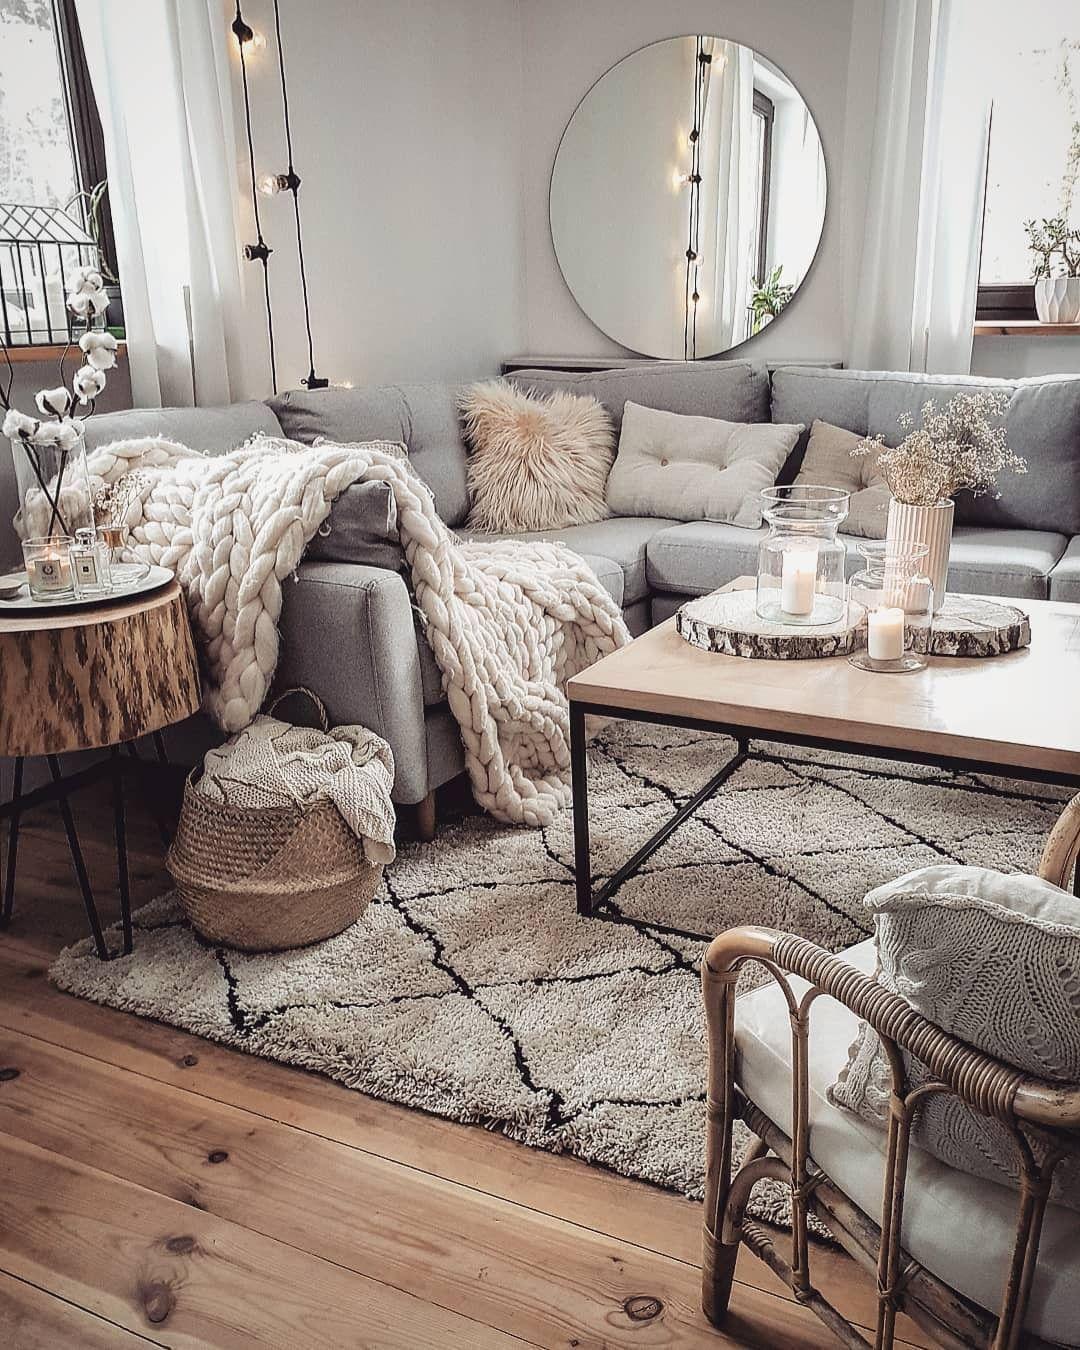 25 Living Room Interior Design Ideas Havenly Interior Design Living Room Living Room Design Modern Living Room Designs